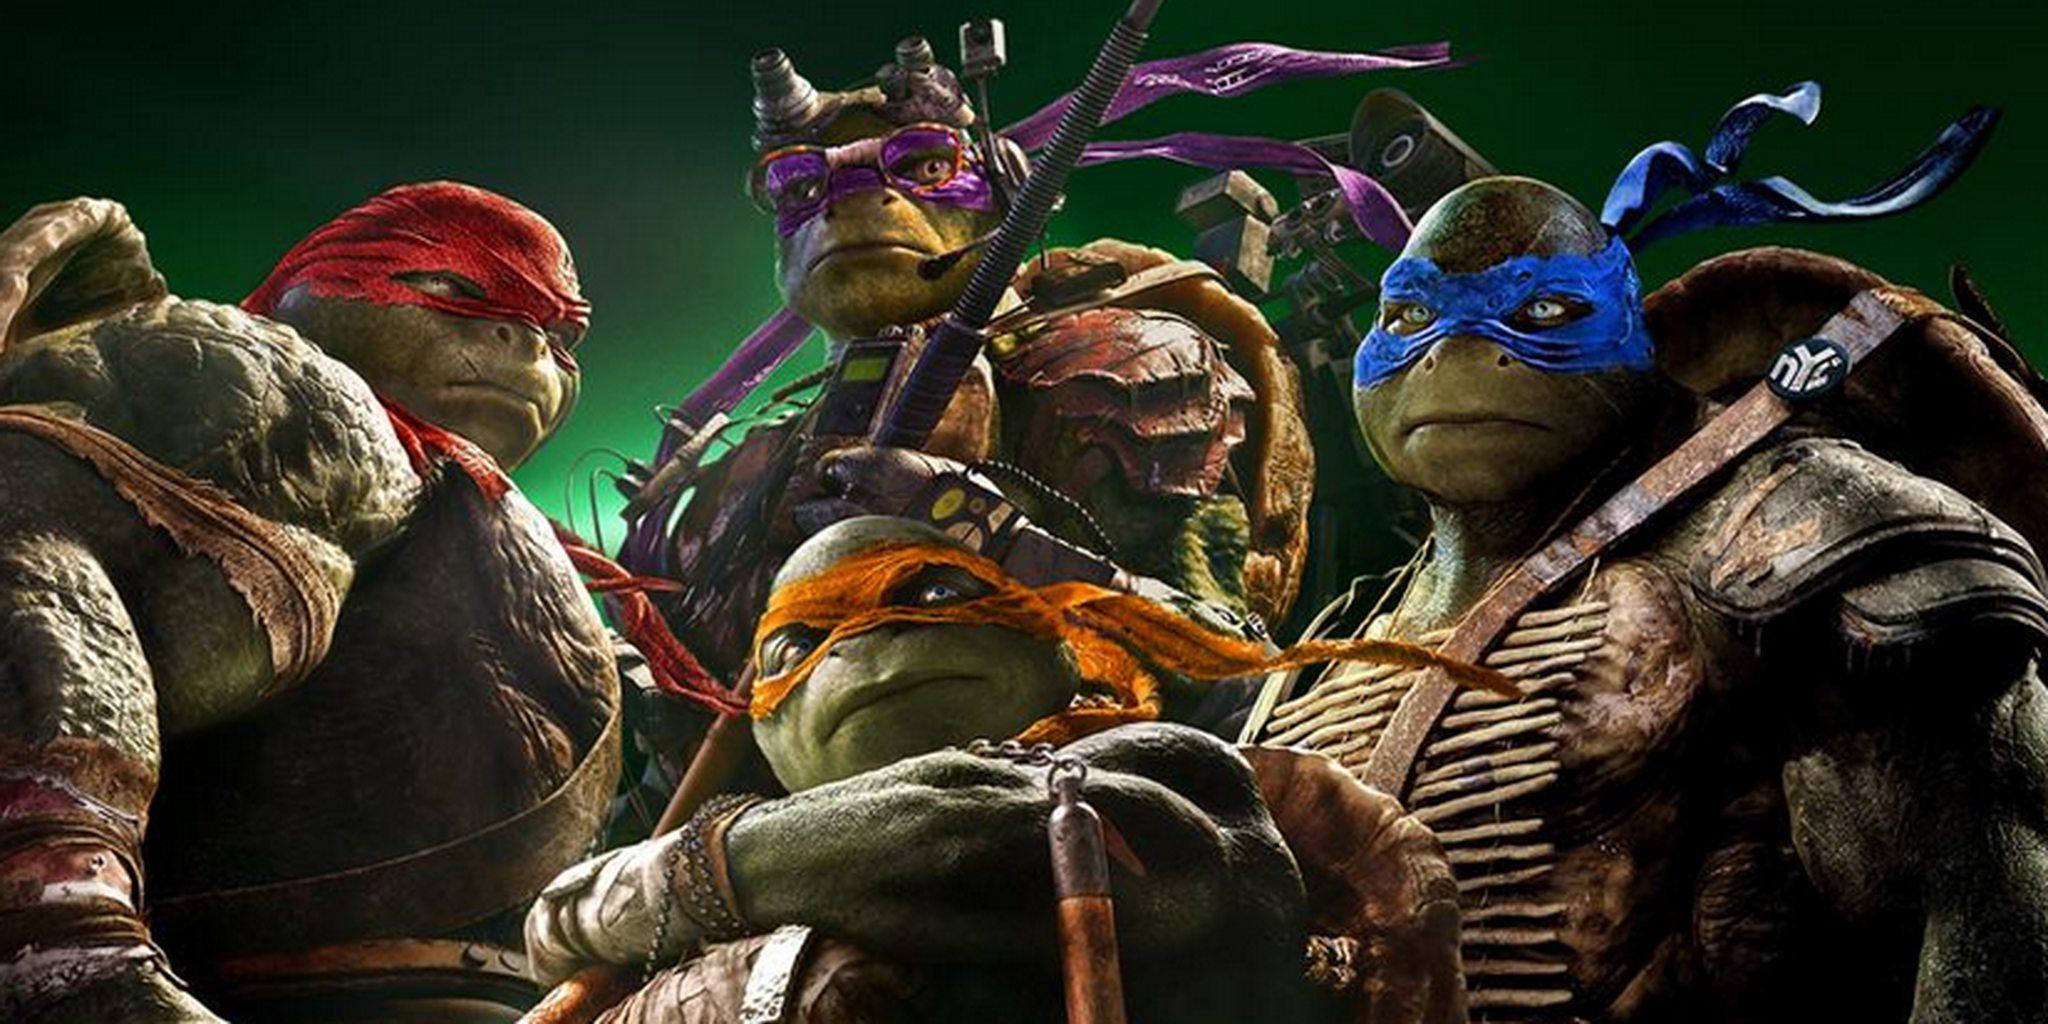 Teenage Mutant Ninja Turtles Backgrounds, Compatible - PC, Mobile, Gadgets| 2048x1024 px